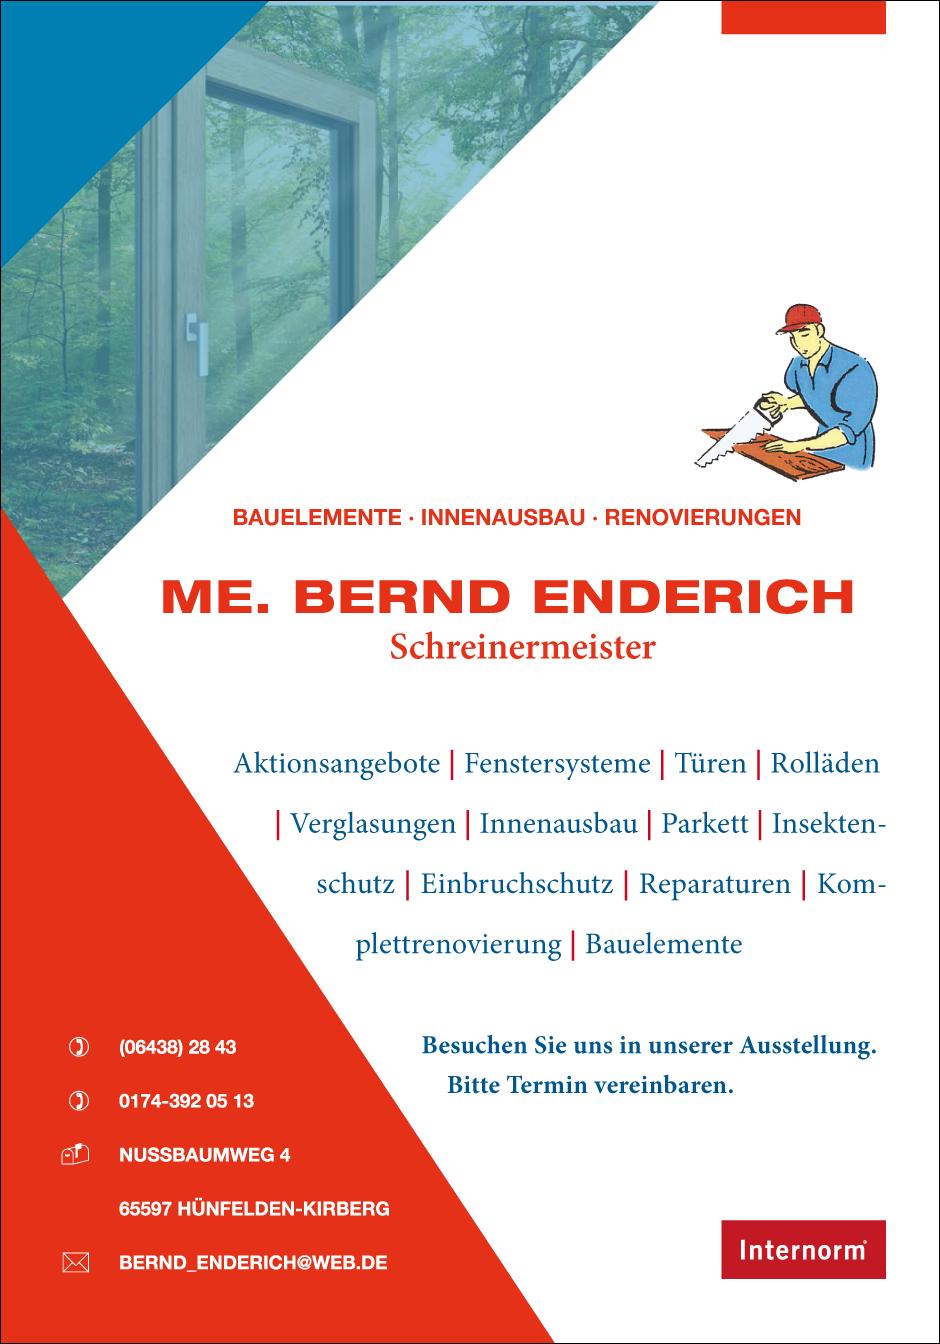 Schneidermeister Bernd Enderich